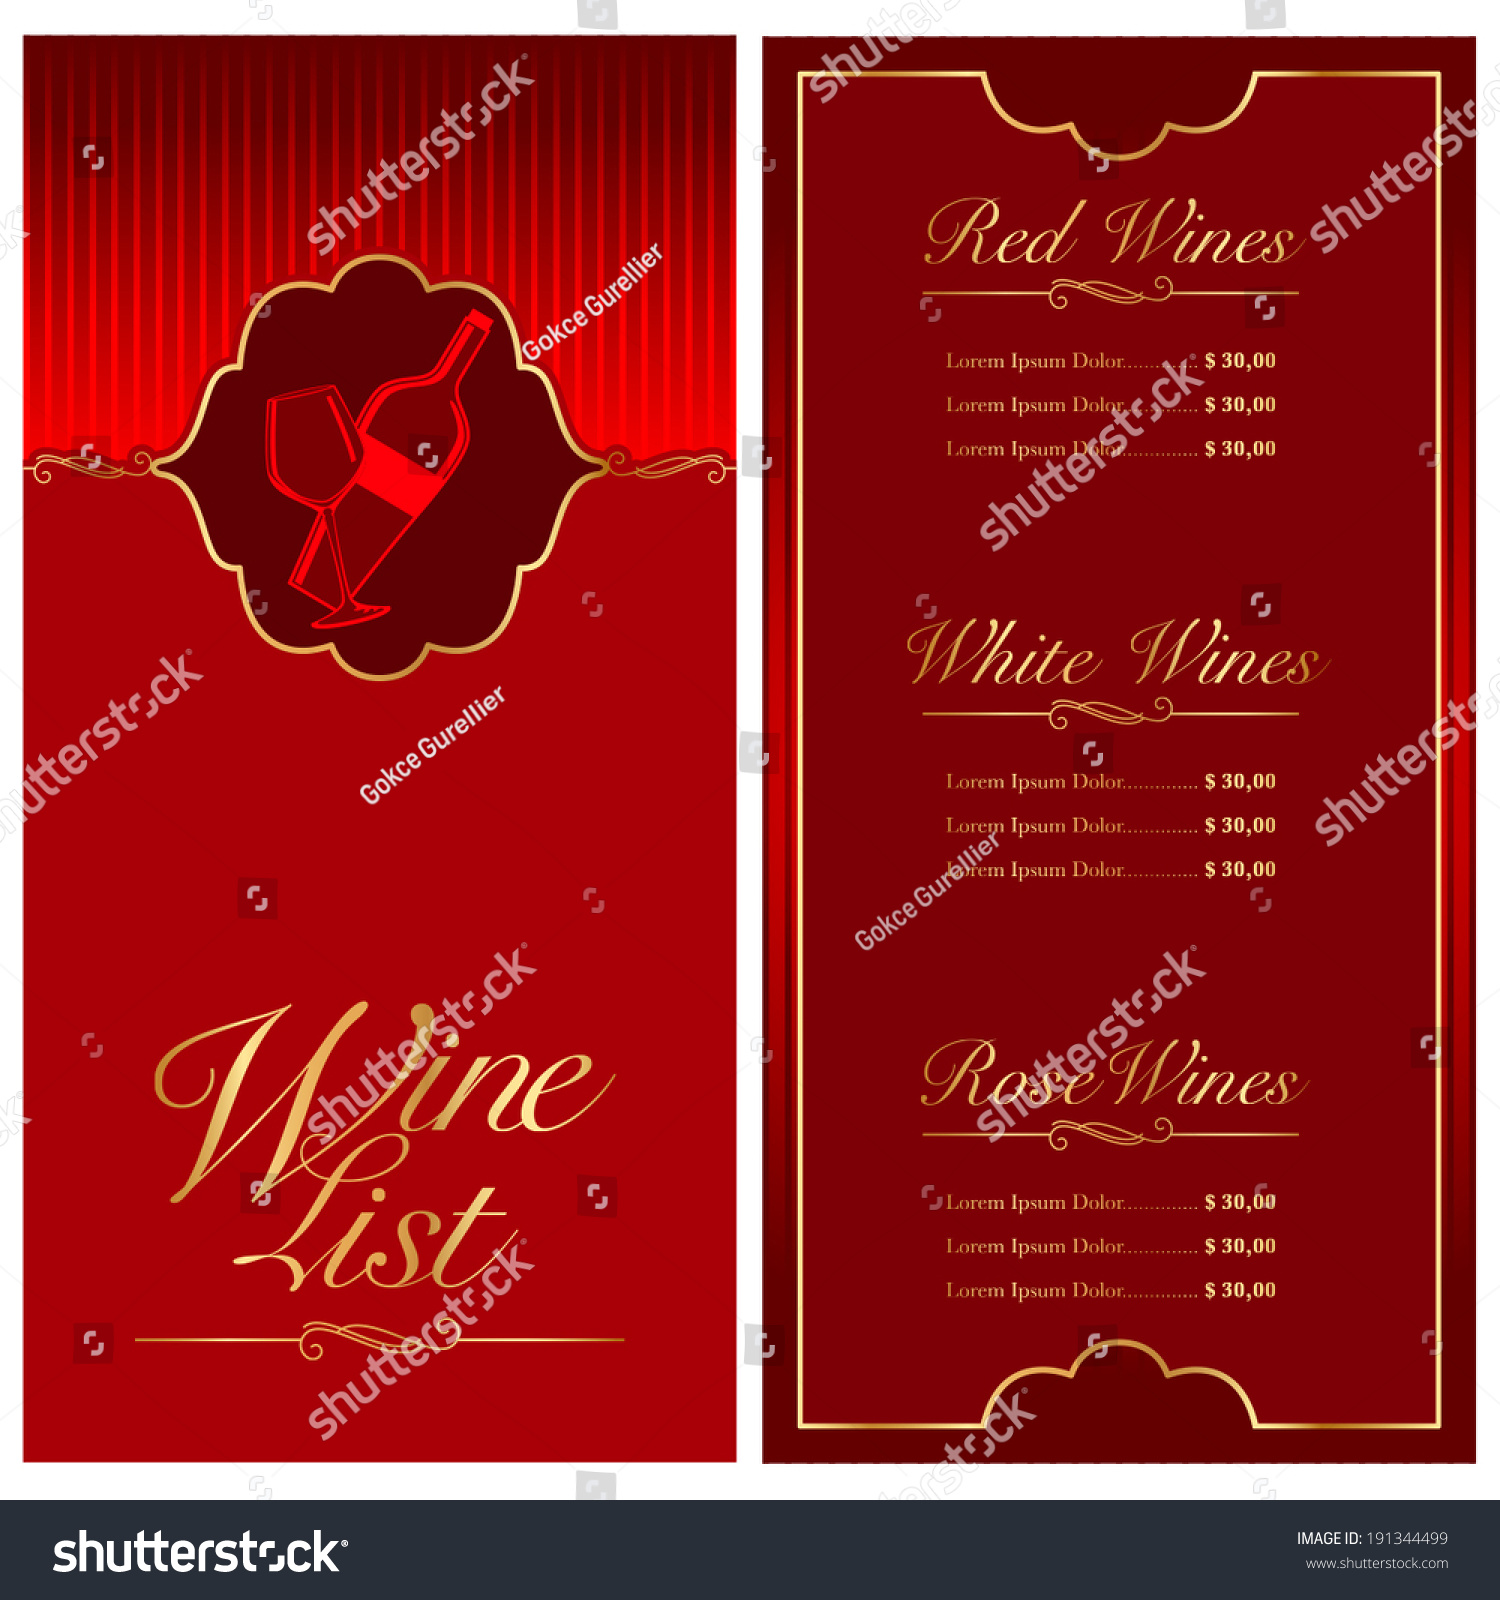 Vector Wine List Menu Design Bar Stock Vector 191344499 - Shutterstock